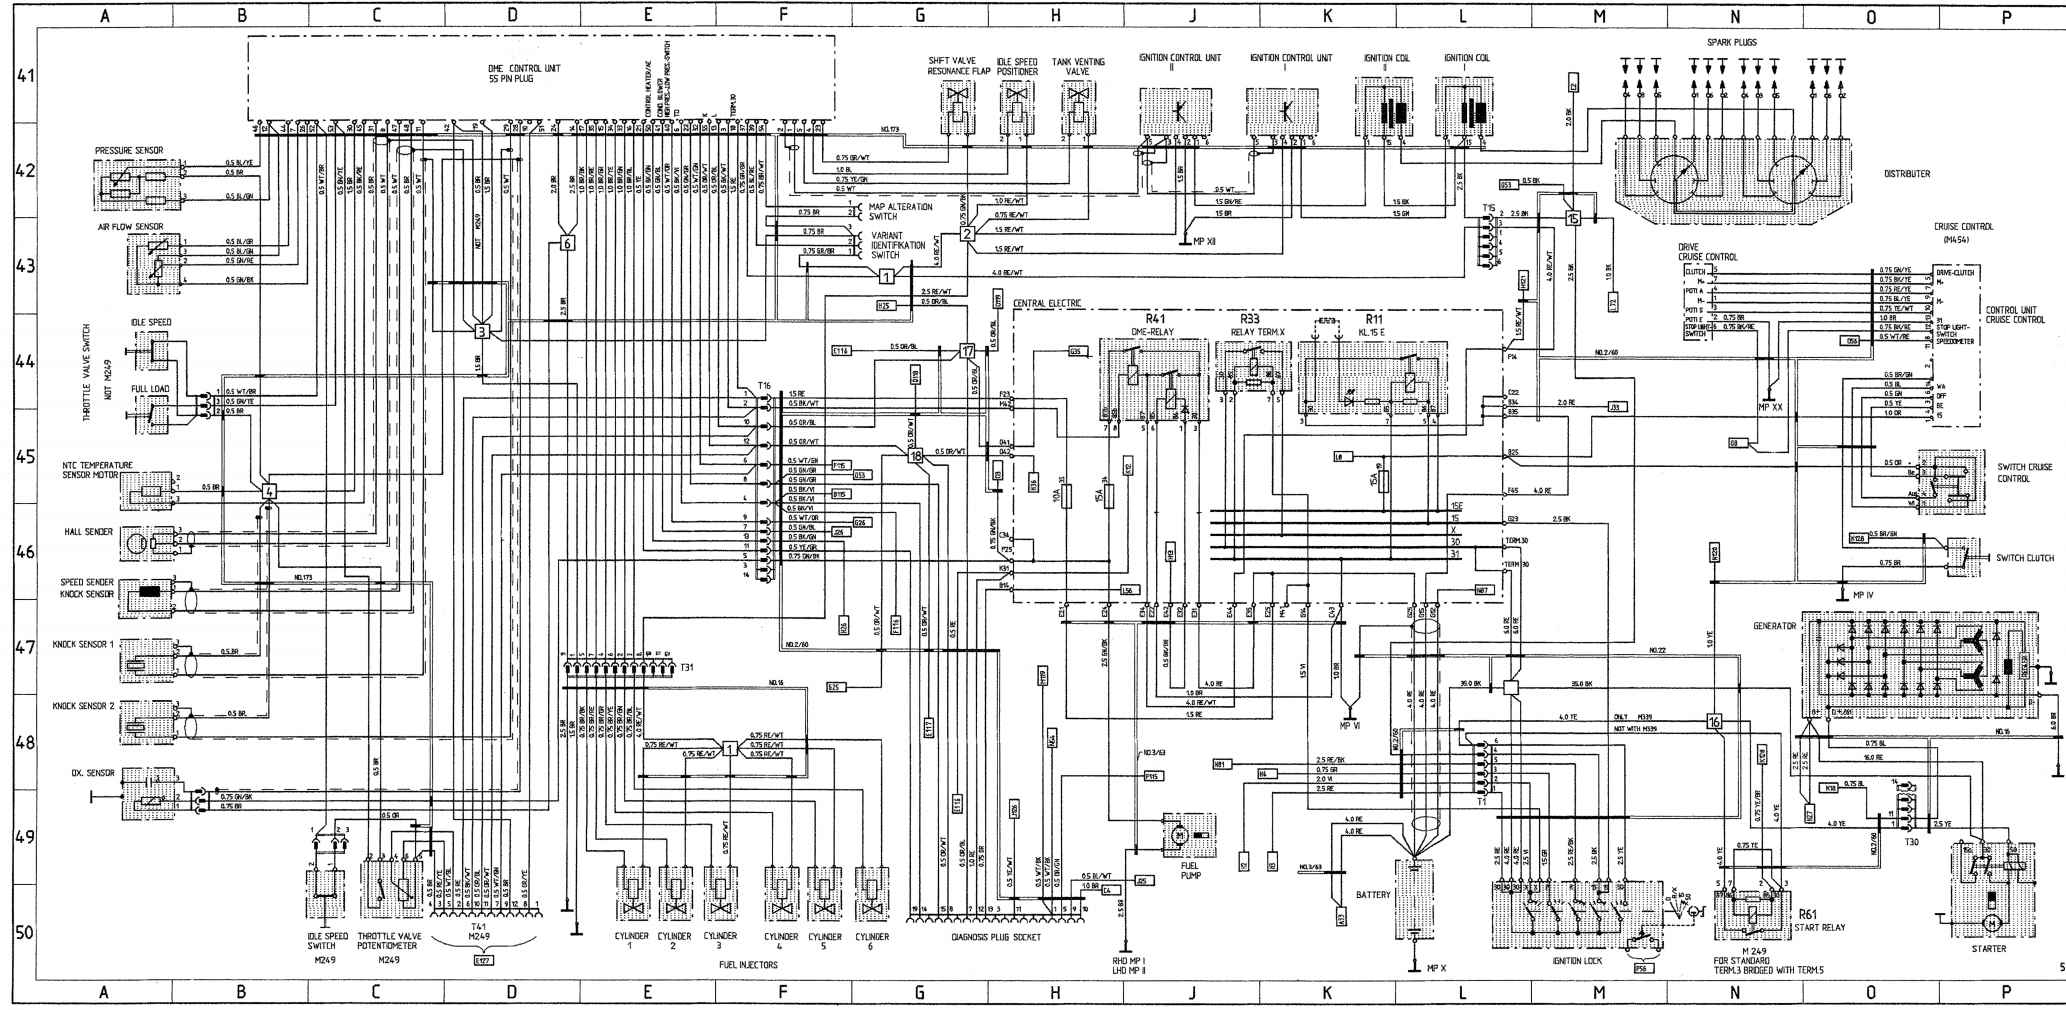 porsche 993 engine wiring diagram - wiring diagrams auto progress-build -  progress-build.moskitofree.it  moskitofree.it